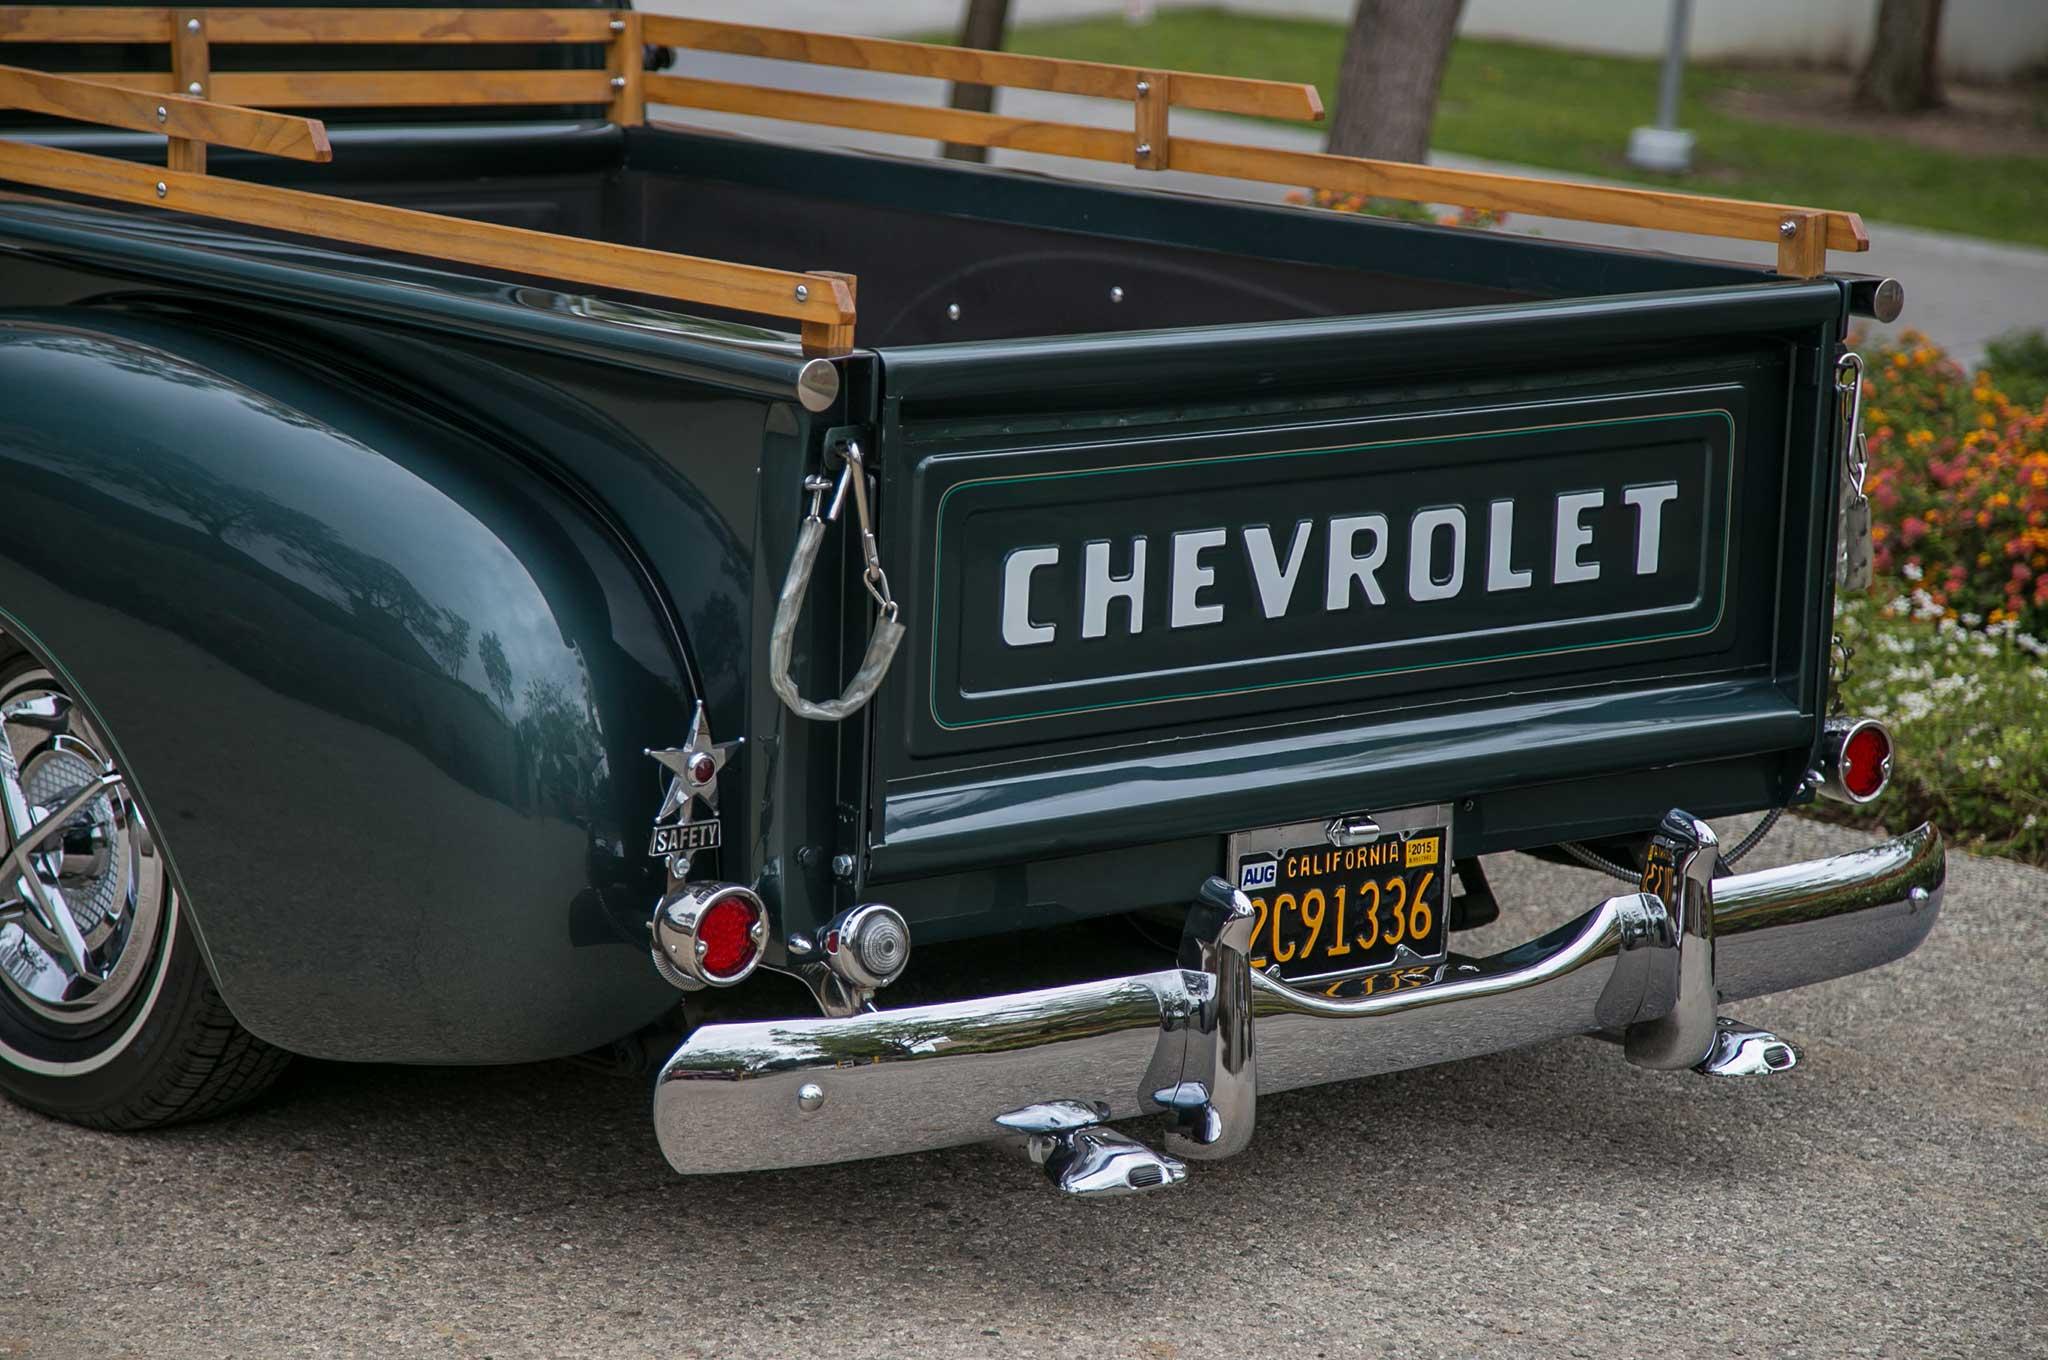 1954 Chevrolet 3100 El Don Lowrider Pick Up 16 29